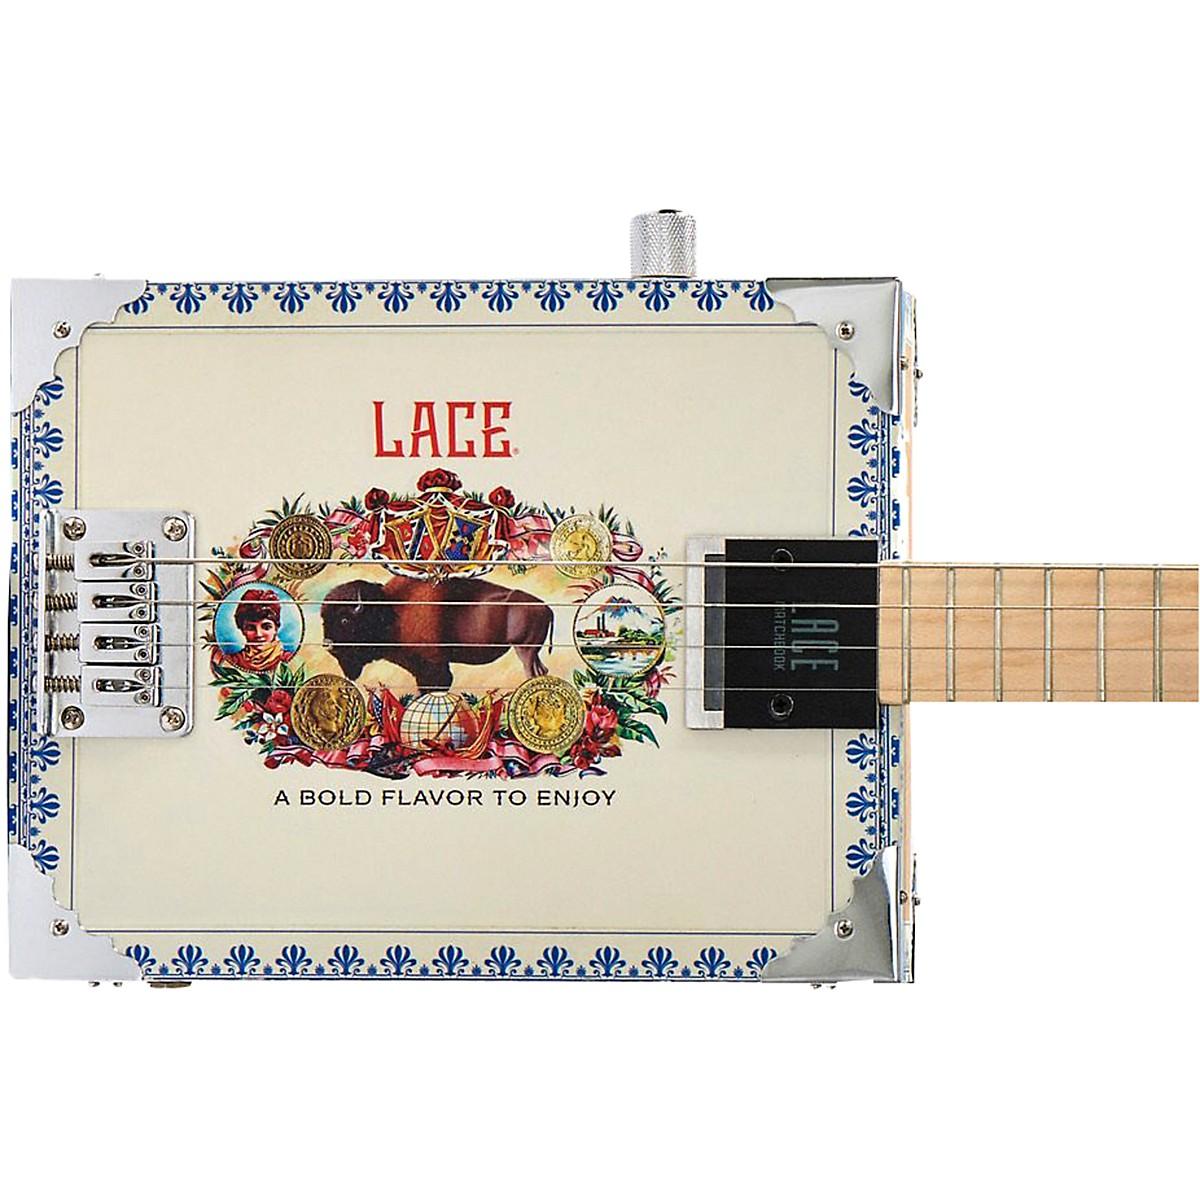 Lace Buffalo Bull Acoutic-Electric Cigar Box Guitar